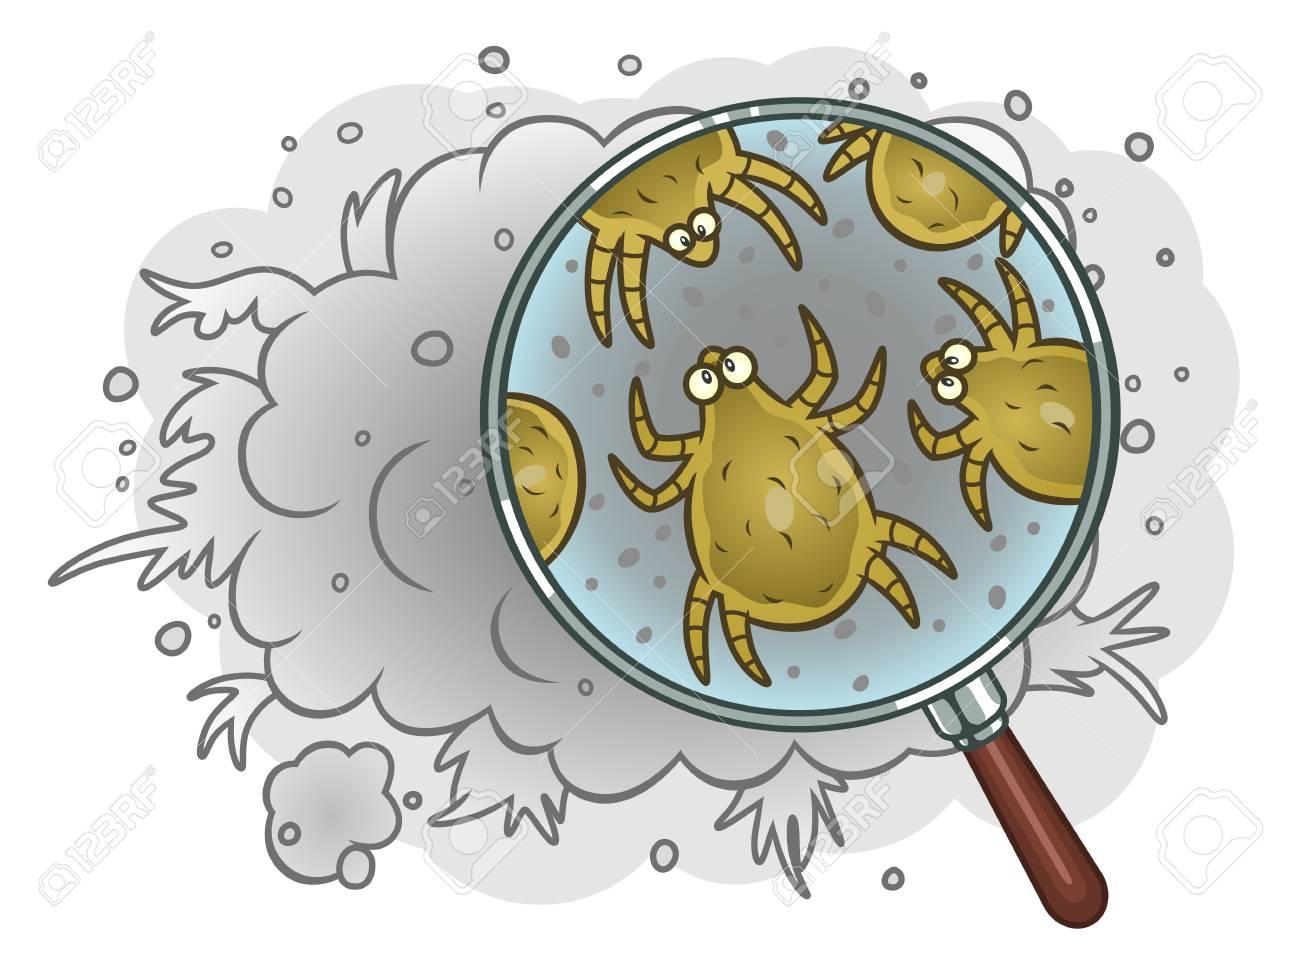 Dust mites in dust - 93873287